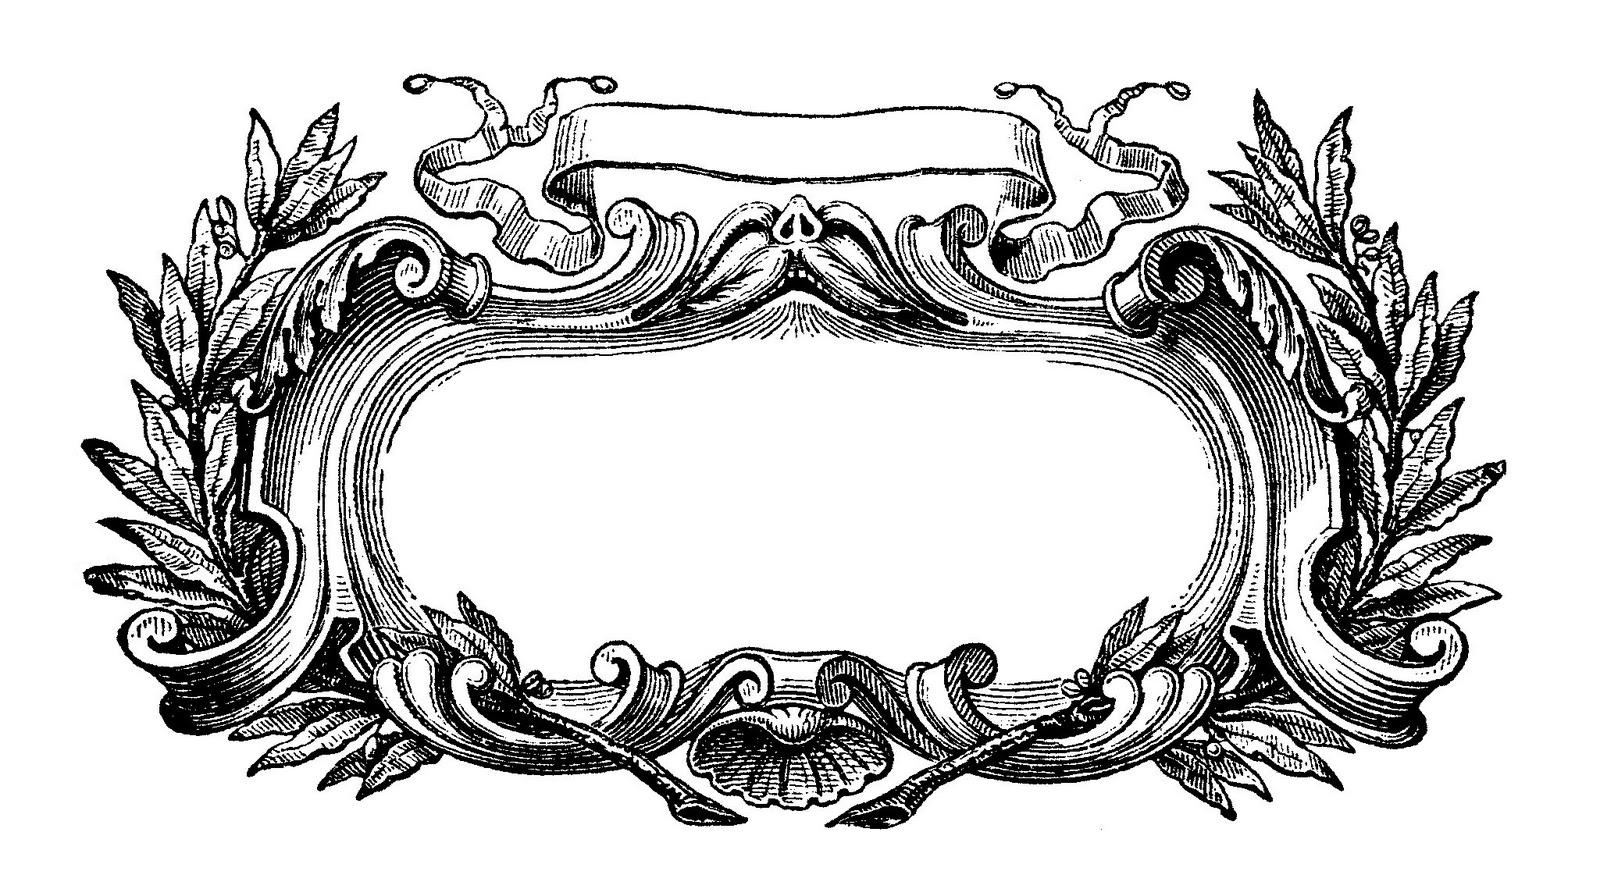 Filigree Frame - Page 2 - Frame Design & Reviews ✓